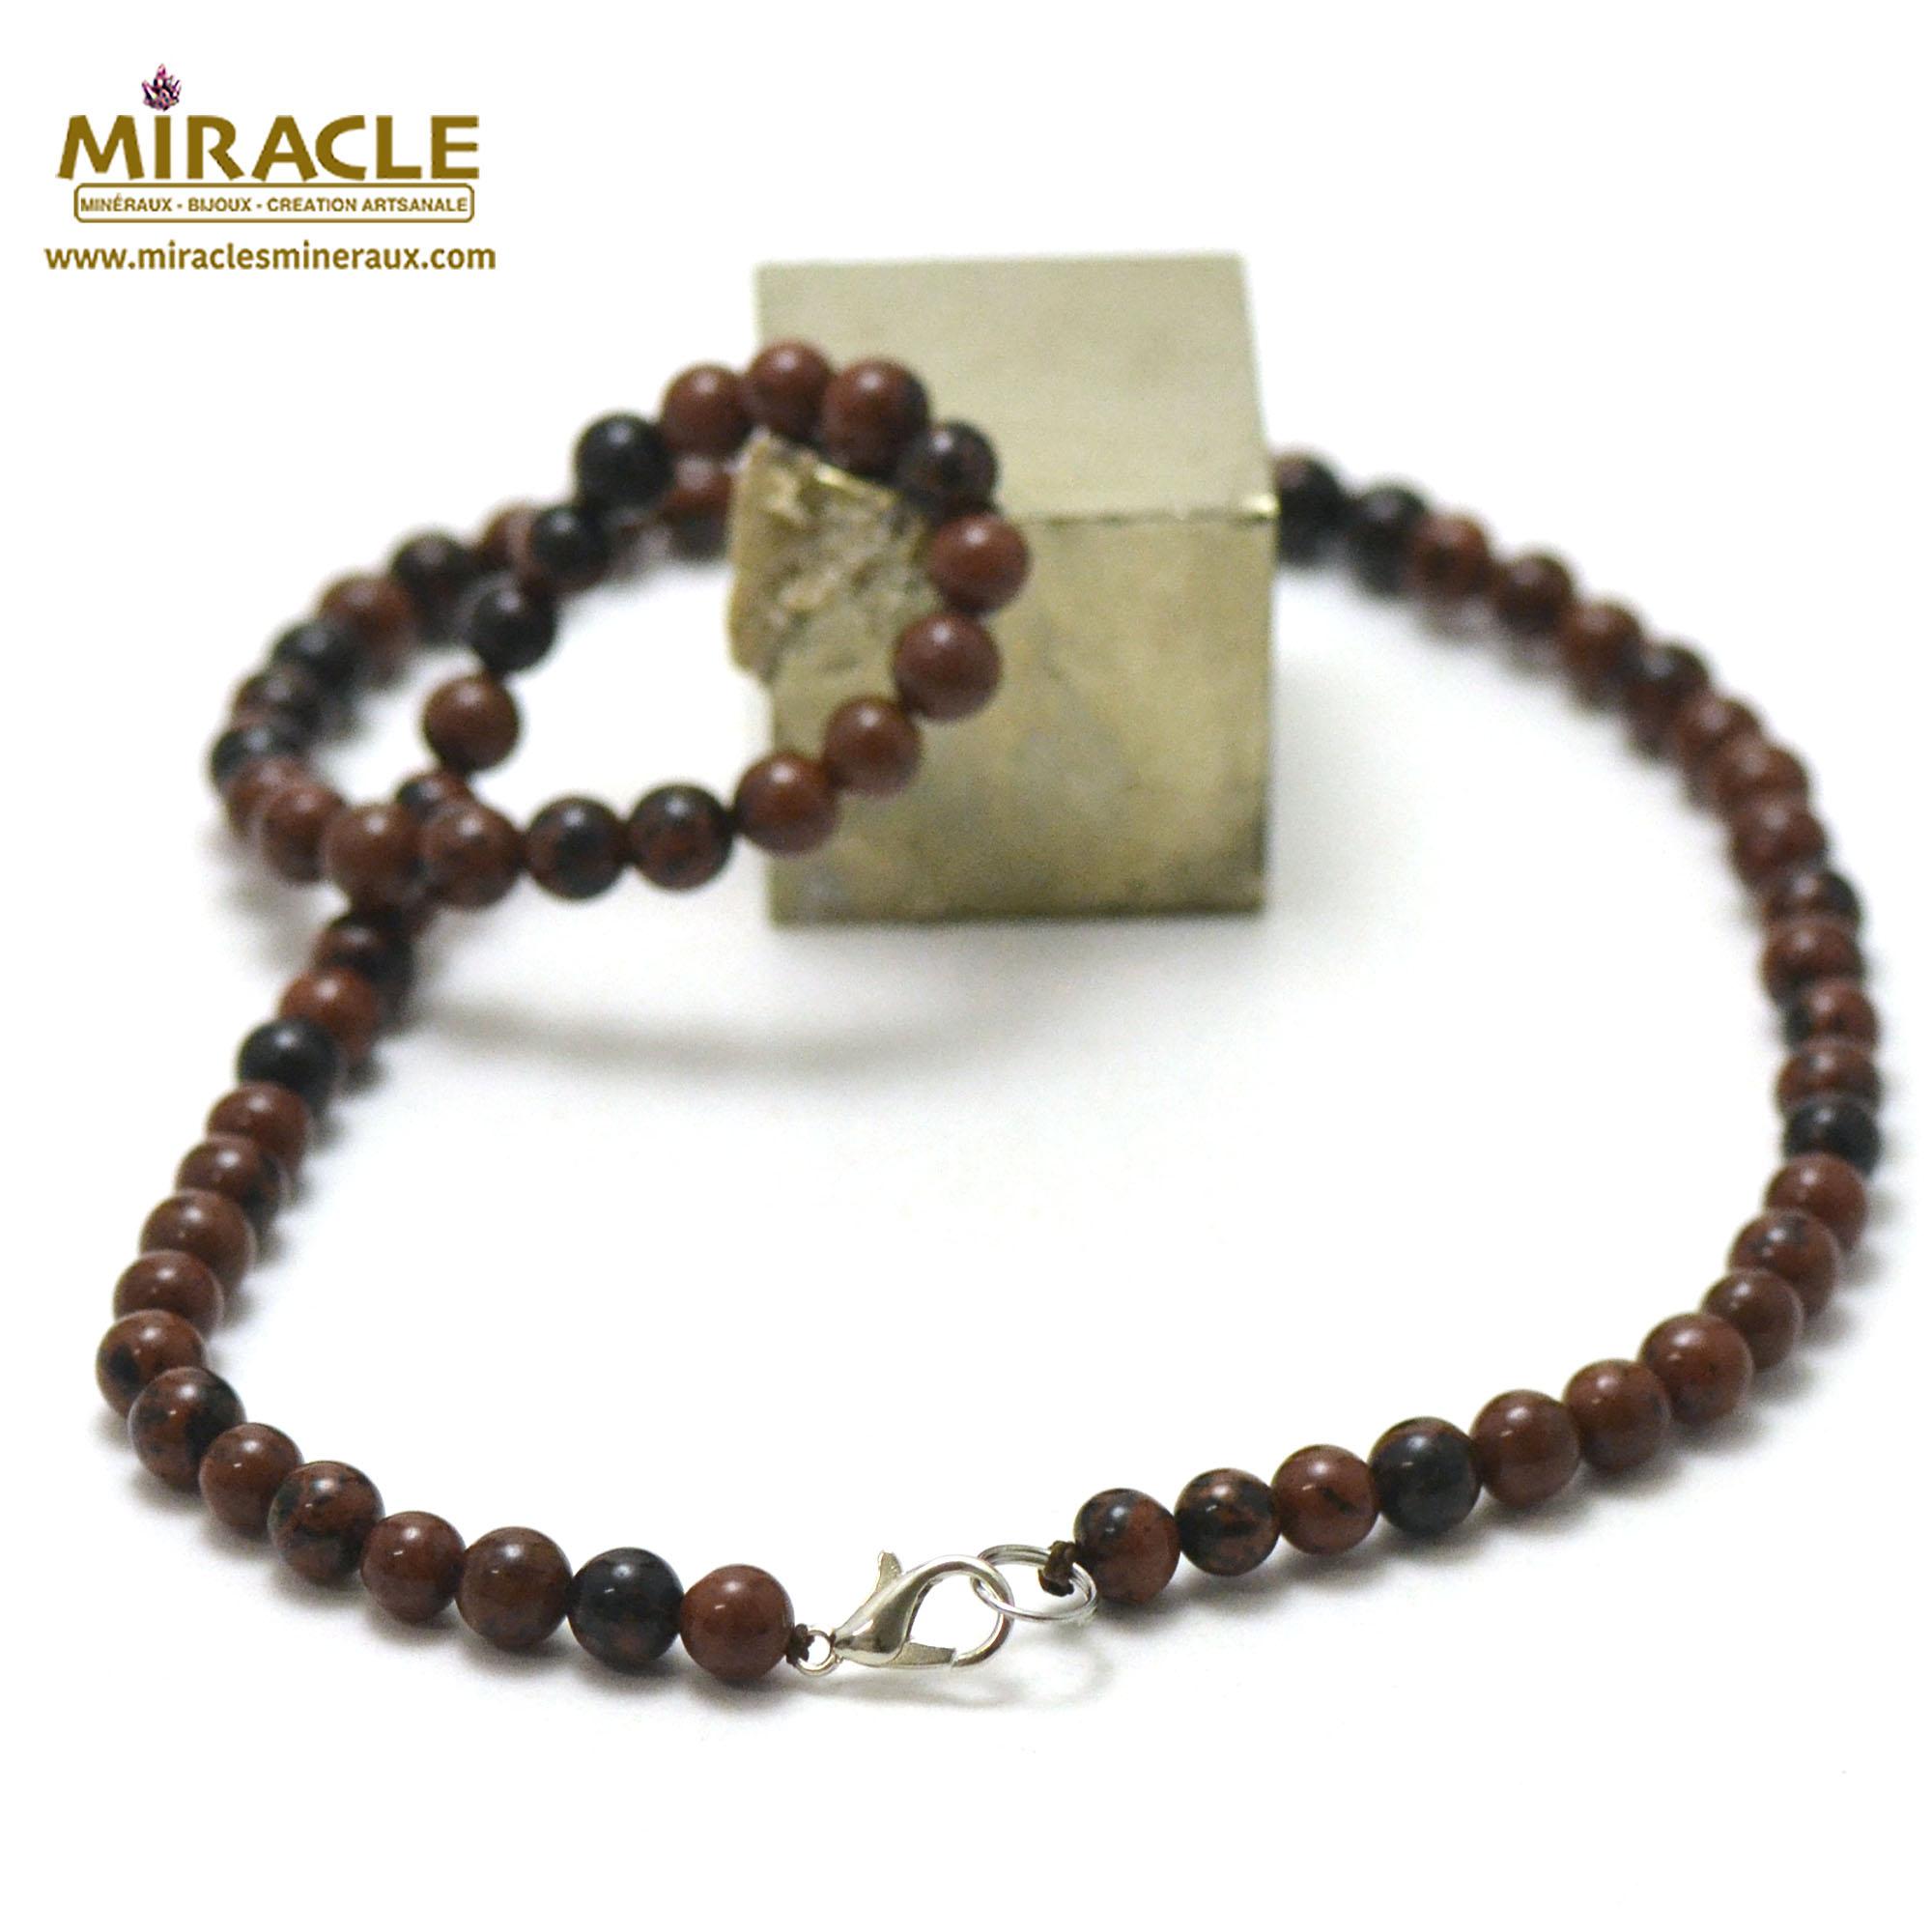 collier obsidienne acajou perle ronde 6 mm